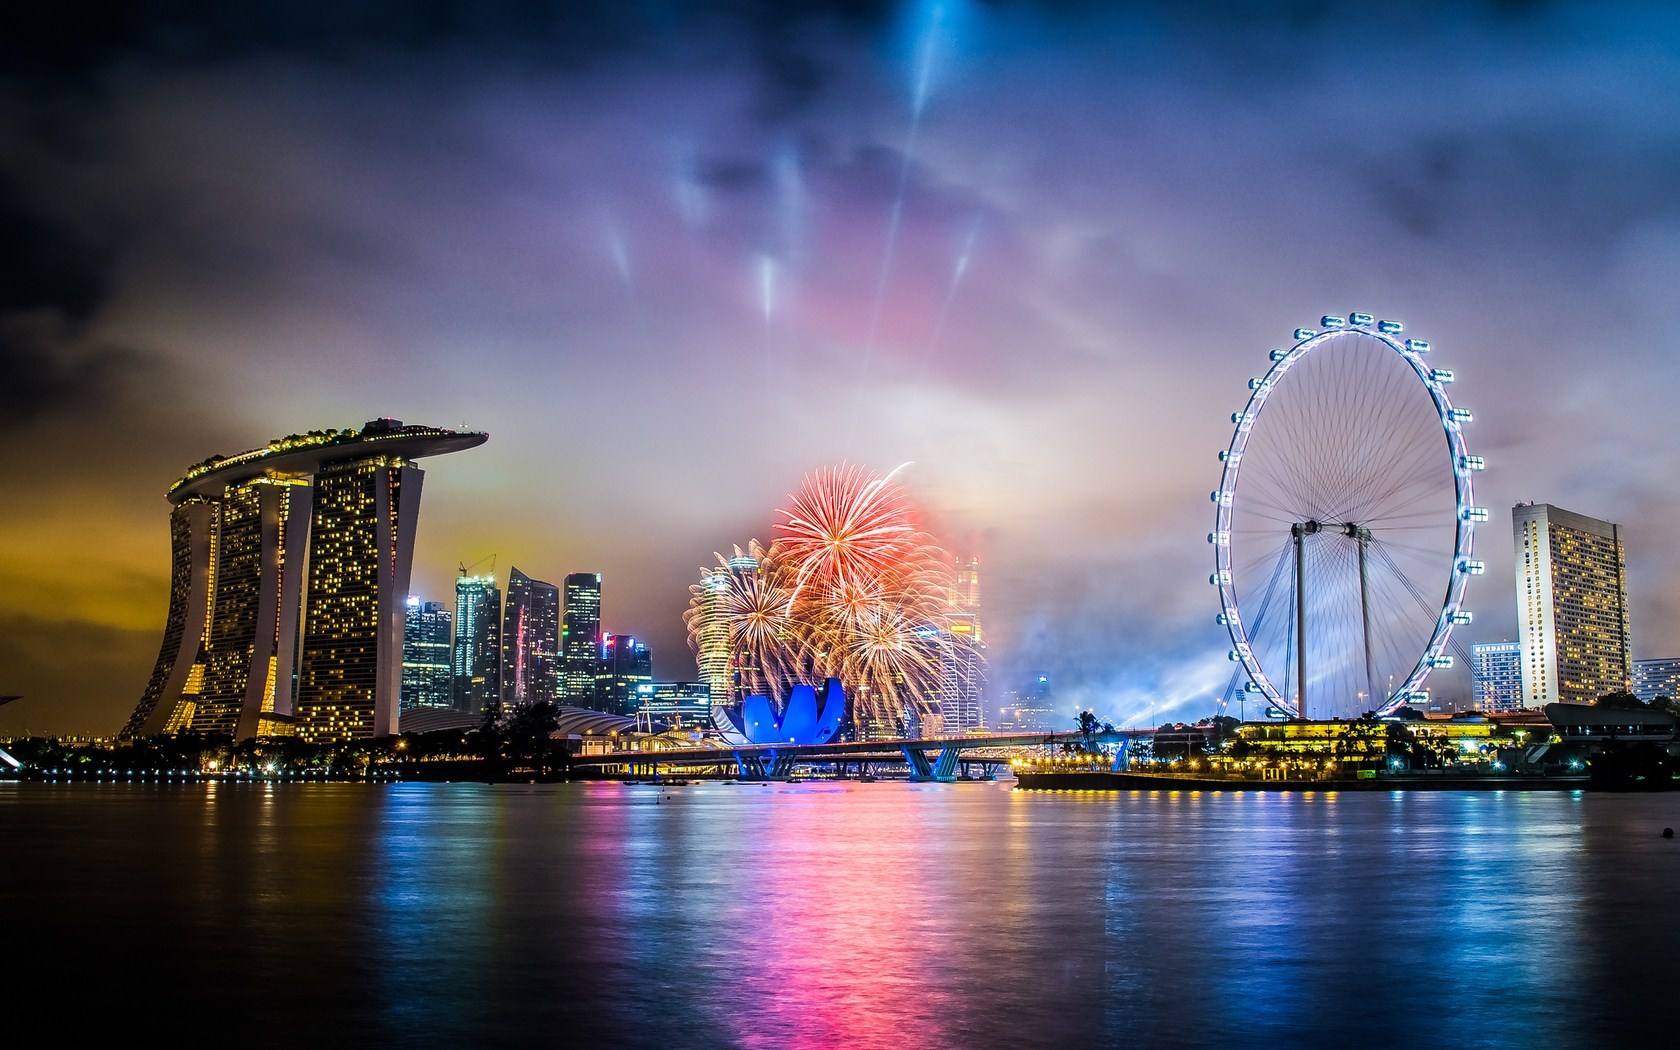 City Singapore Night Holiday Fireworks